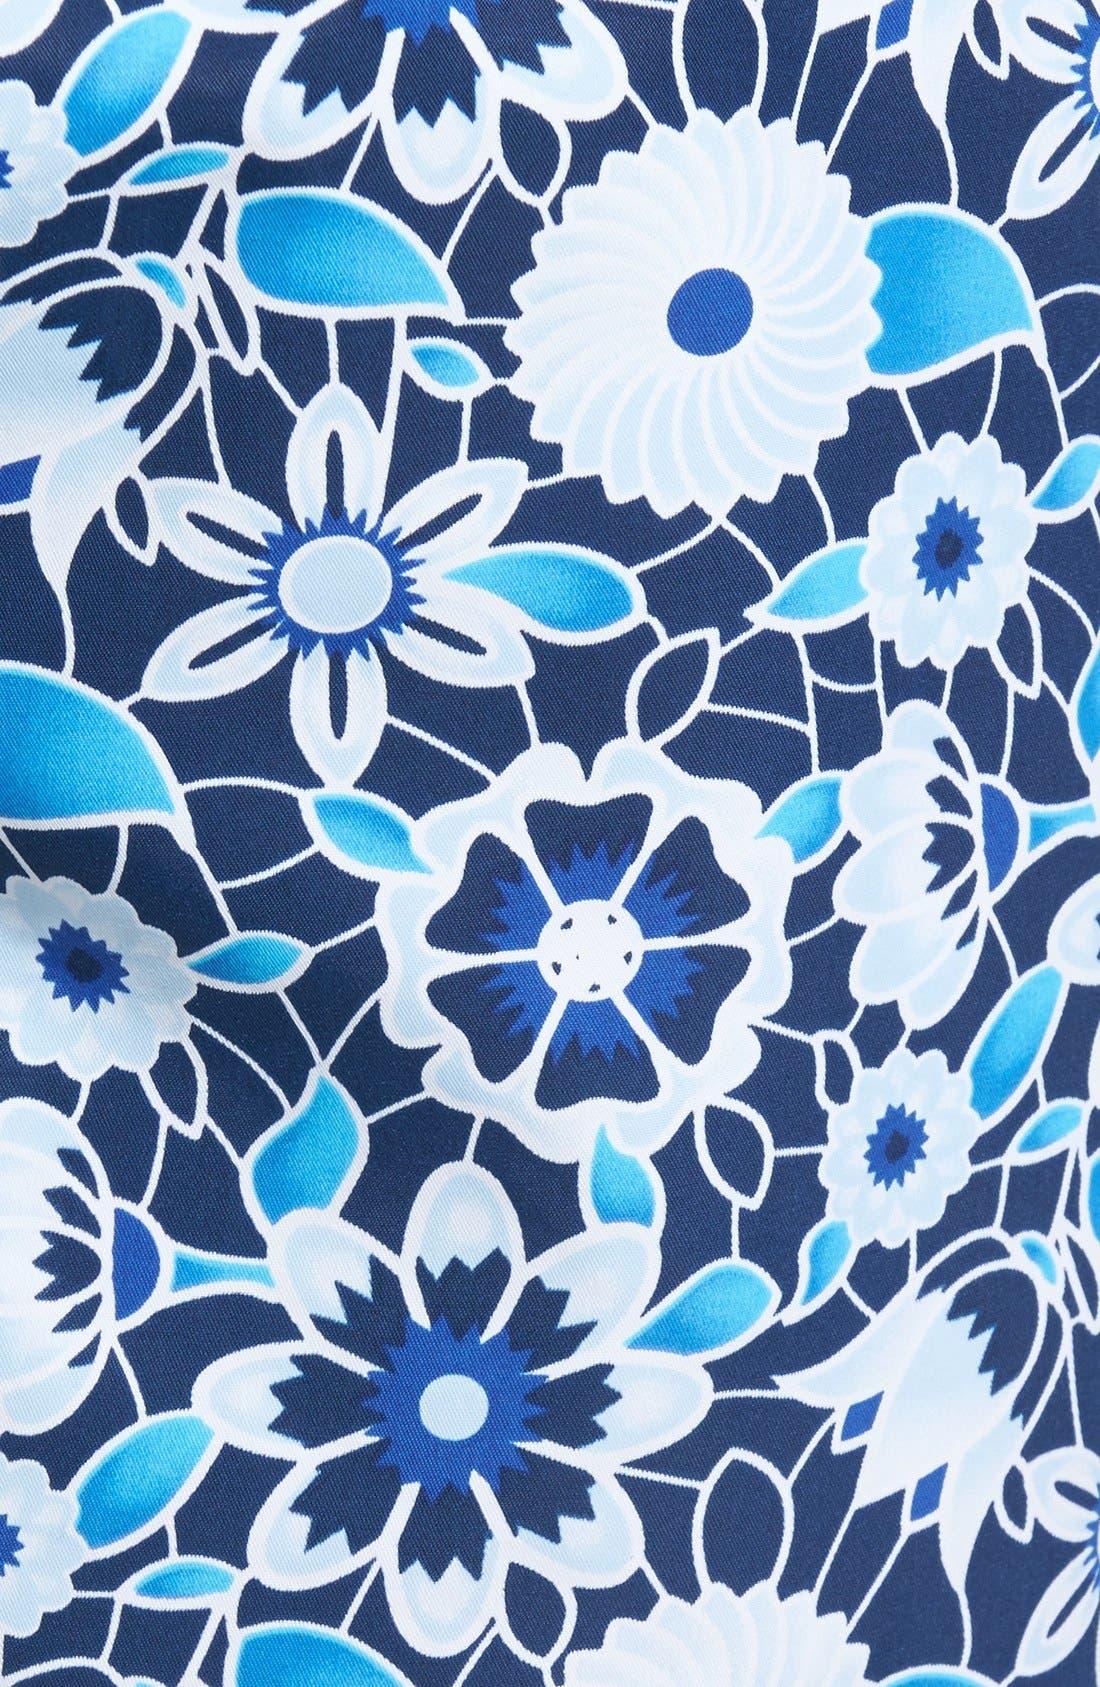 Floral Print Swim Trunks,                             Alternate thumbnail 5, color,                             420